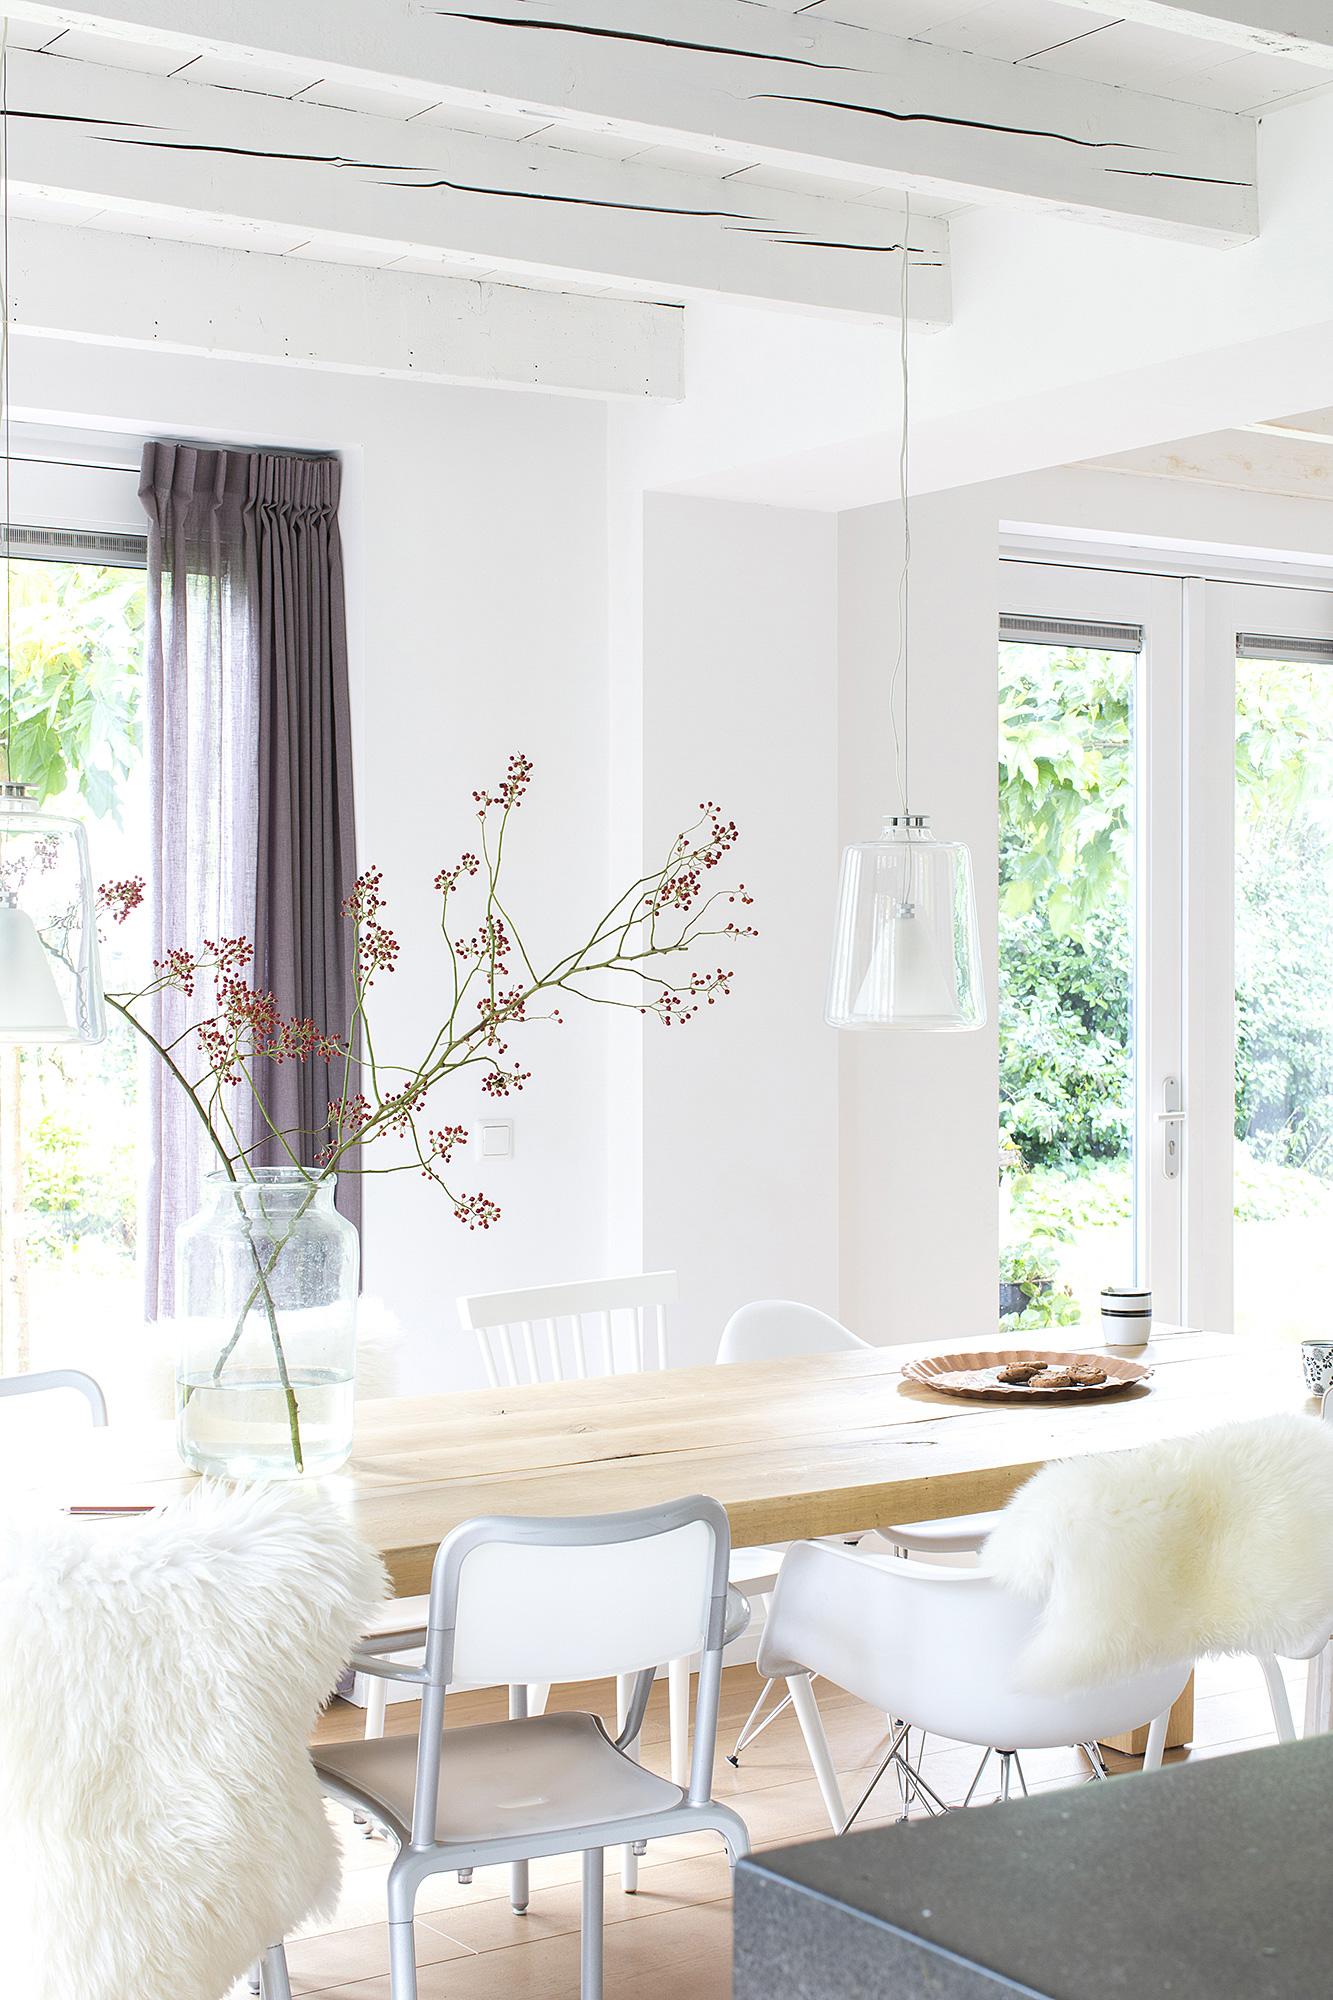 verbouwde boerderij utrecht margriet hoekstra. Black Bedroom Furniture Sets. Home Design Ideas